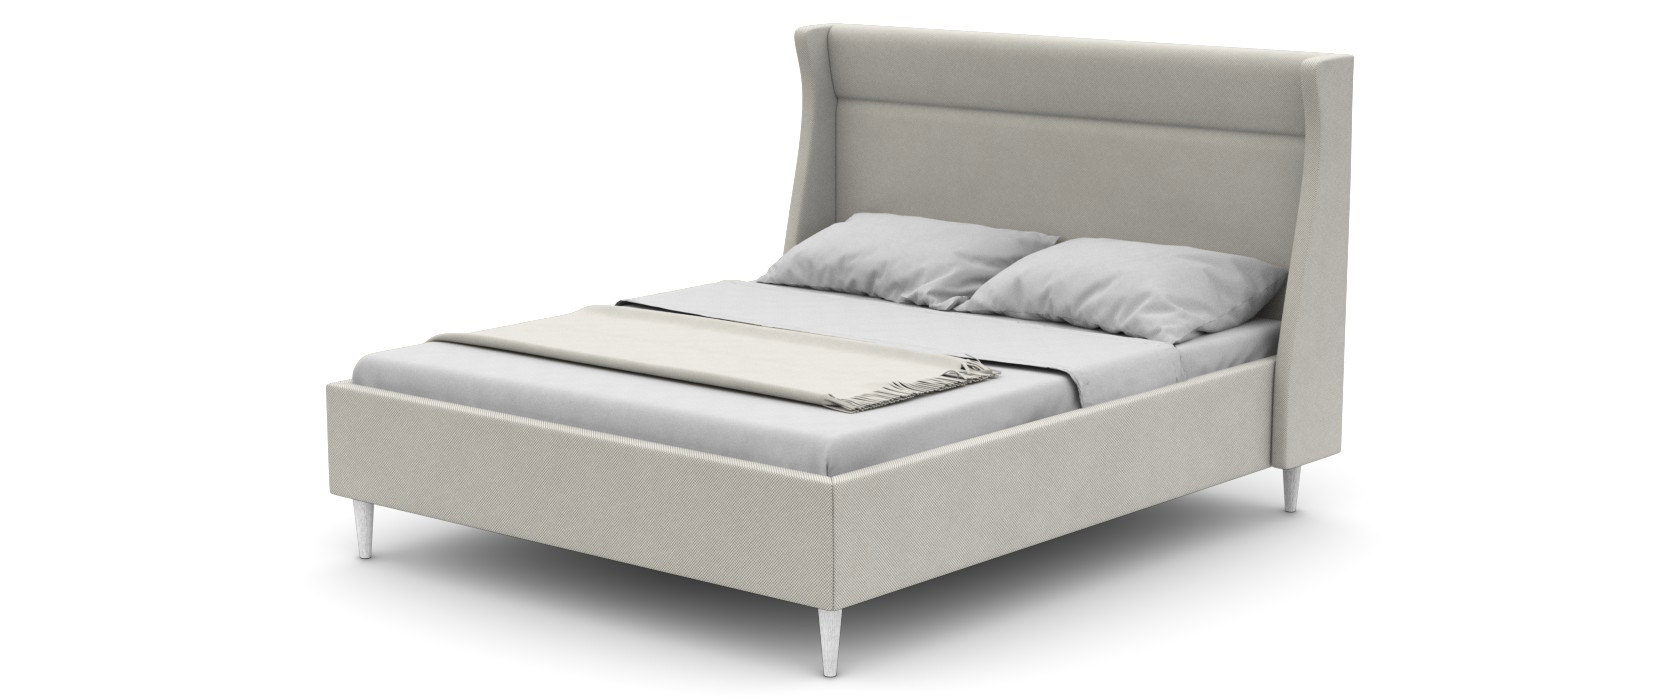 Ліжко Crona - Pufetto